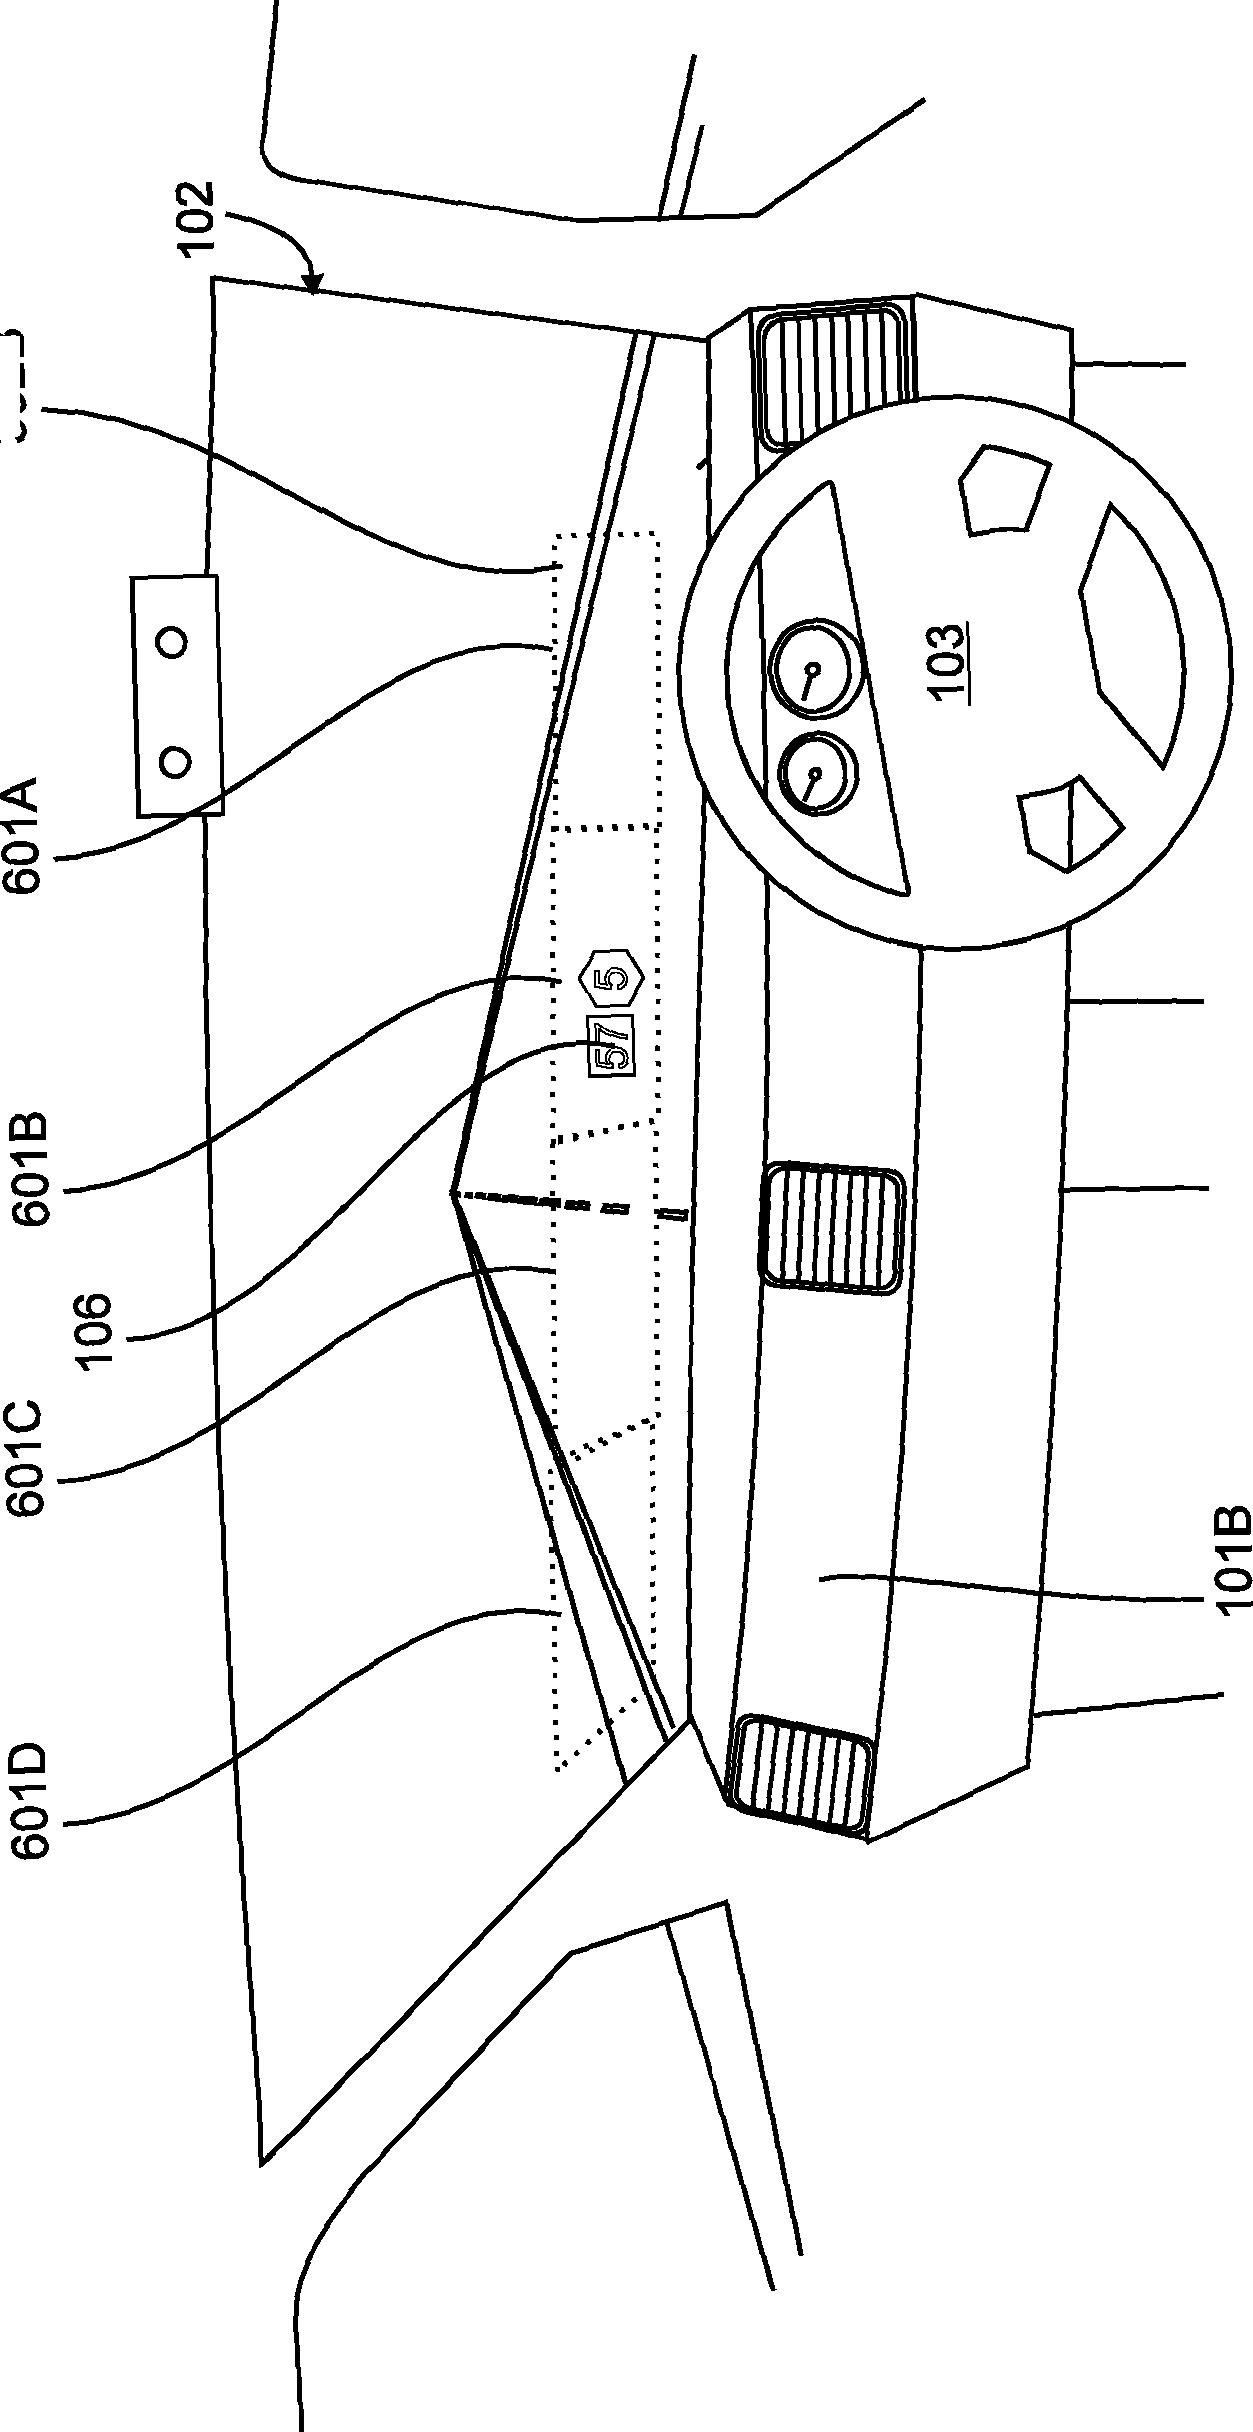 Figure GB2559606A_D0007